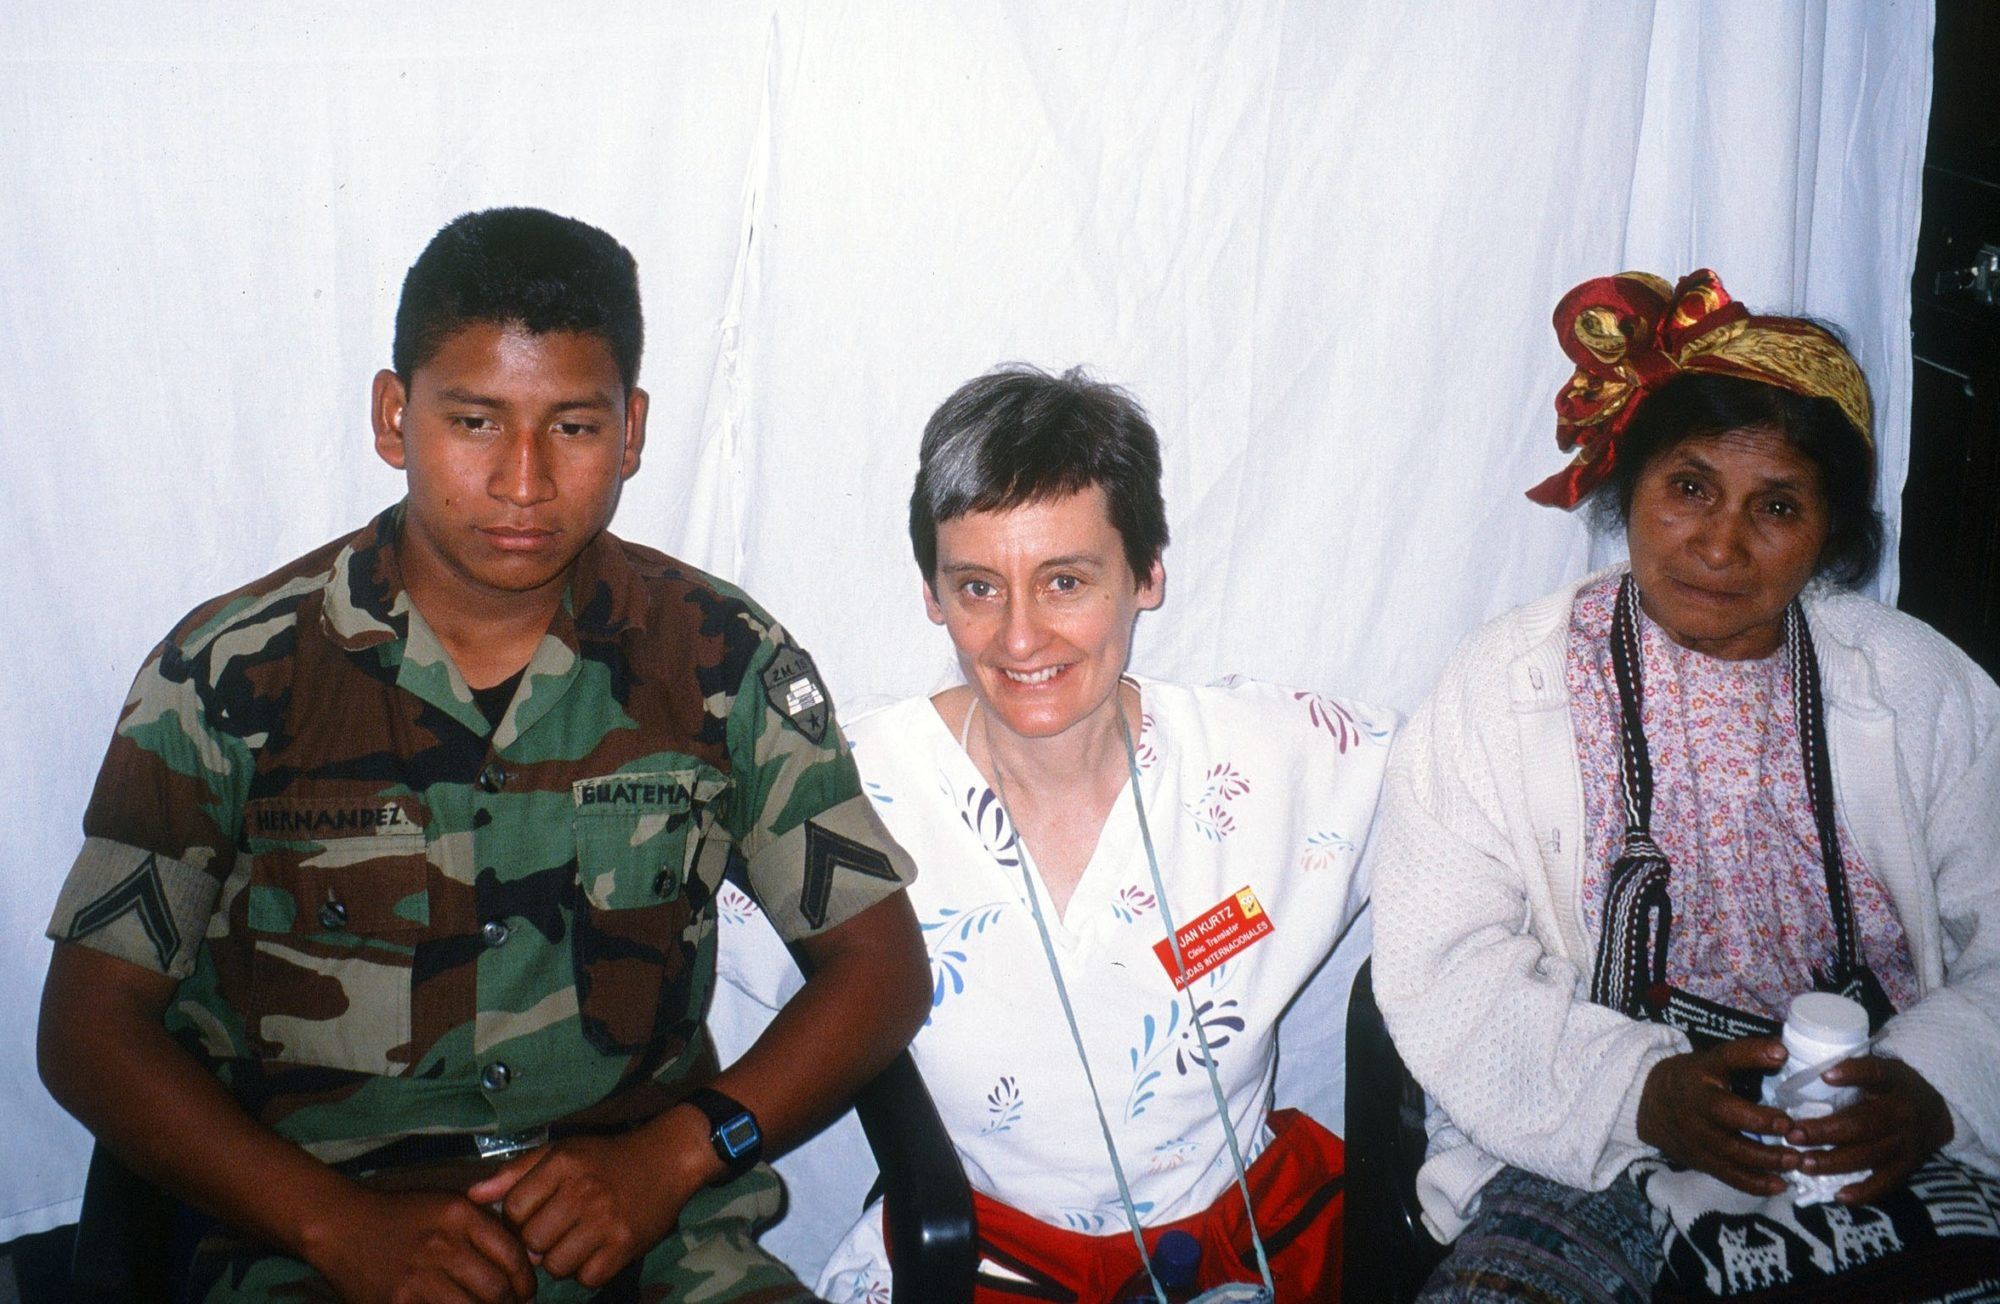 Jan working as translator for HELPS International in Barillas, Guatemala. The military man spoke Spanish and Kojobal (Mayan dialect) enabling communication with the Mayan elder. (2003)